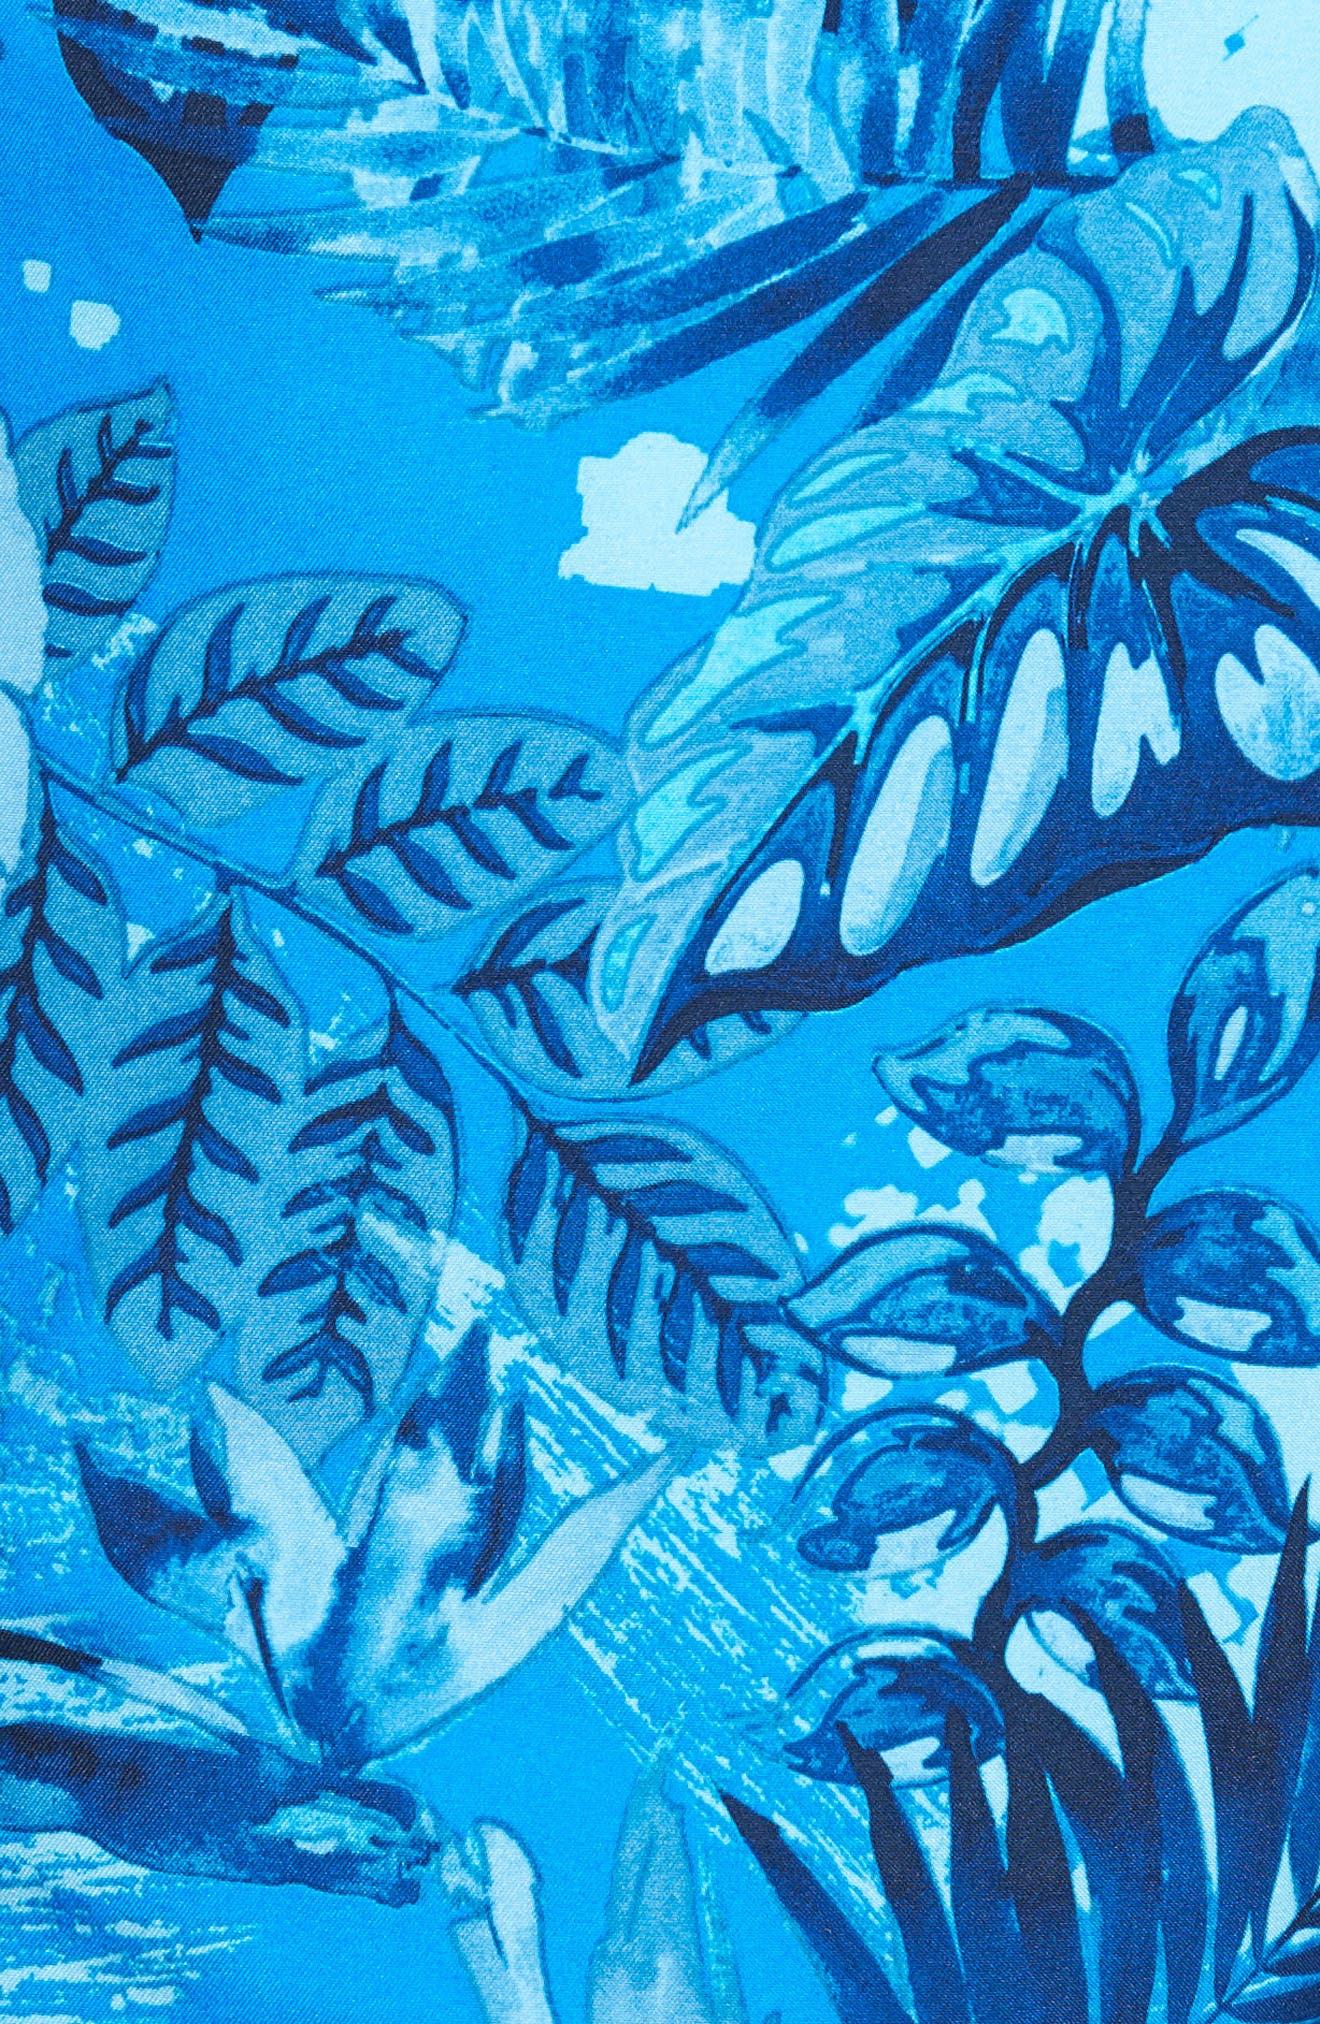 TOMMY BAHAMA,                             Baja Selva Shores Board Shorts,                             Alternate thumbnail 5, color,                             400